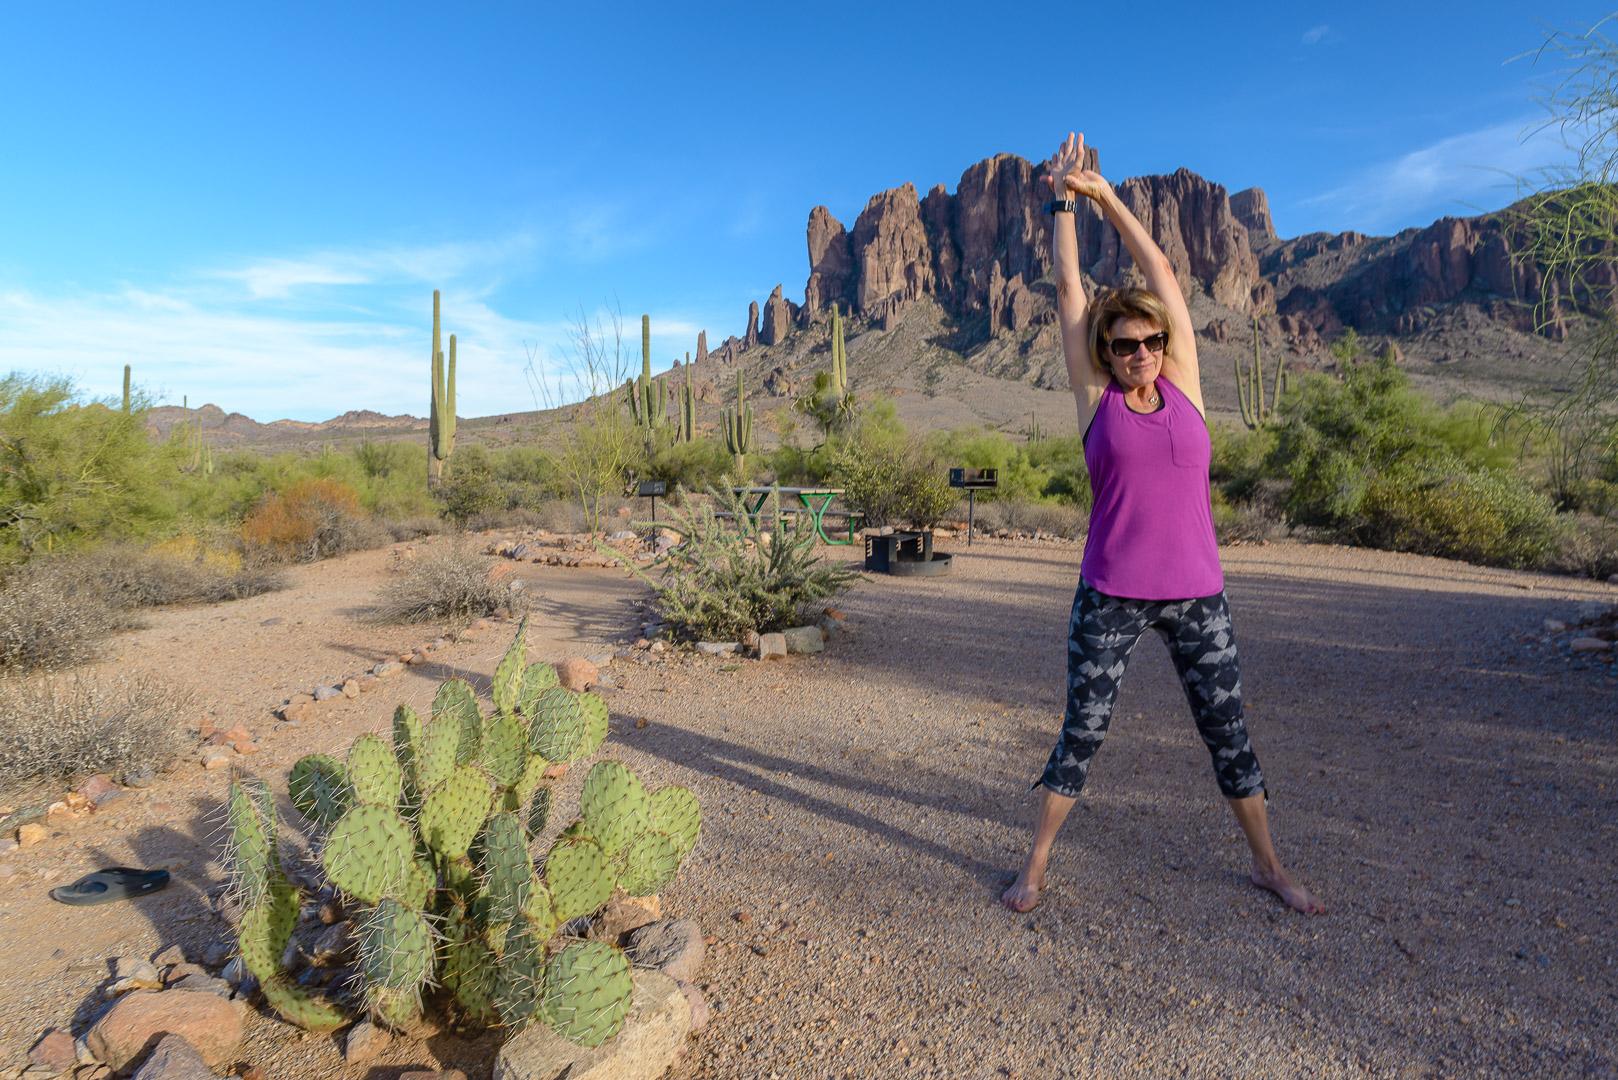 Lost Durchman State Park (Arizona)